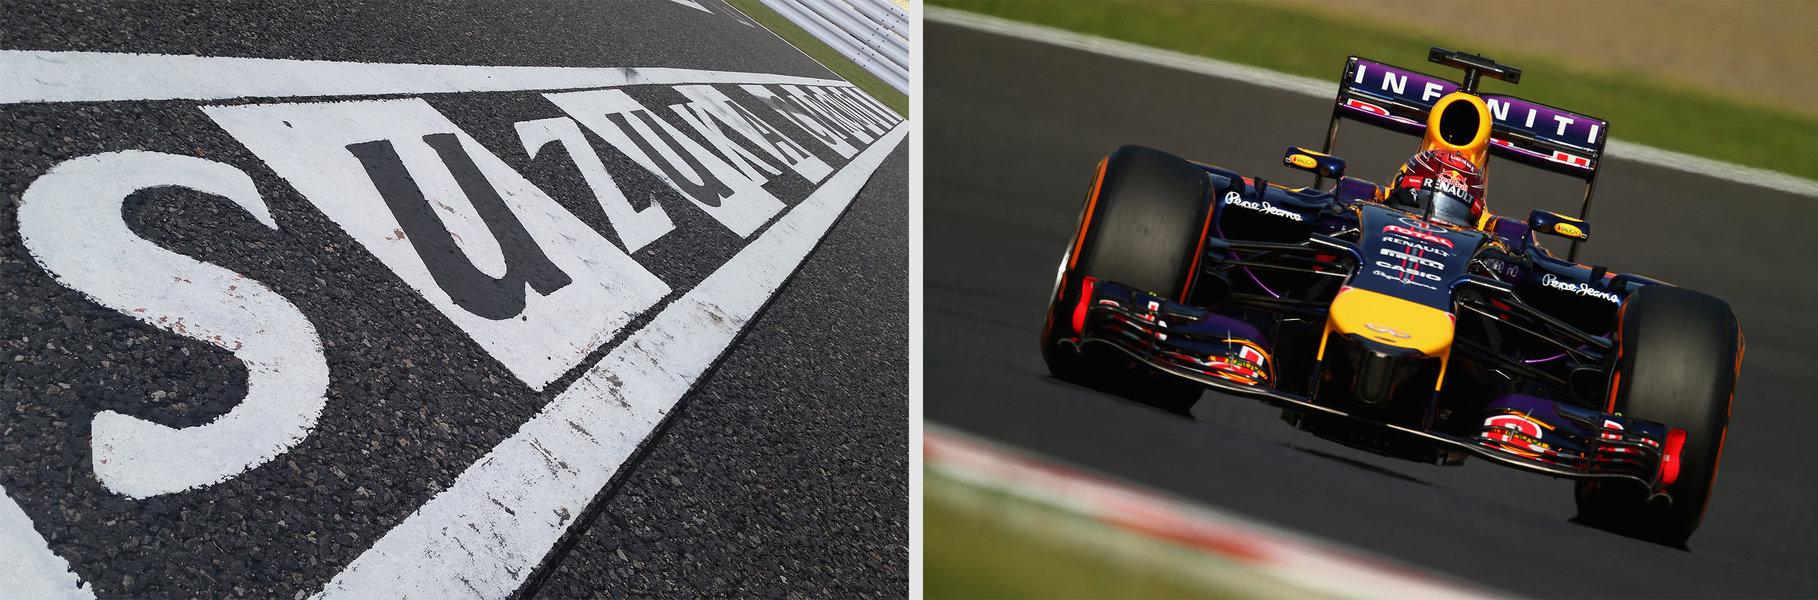 Suzuka pondrá a prueba a los pilotos de Fórmula 1 este fin de semana